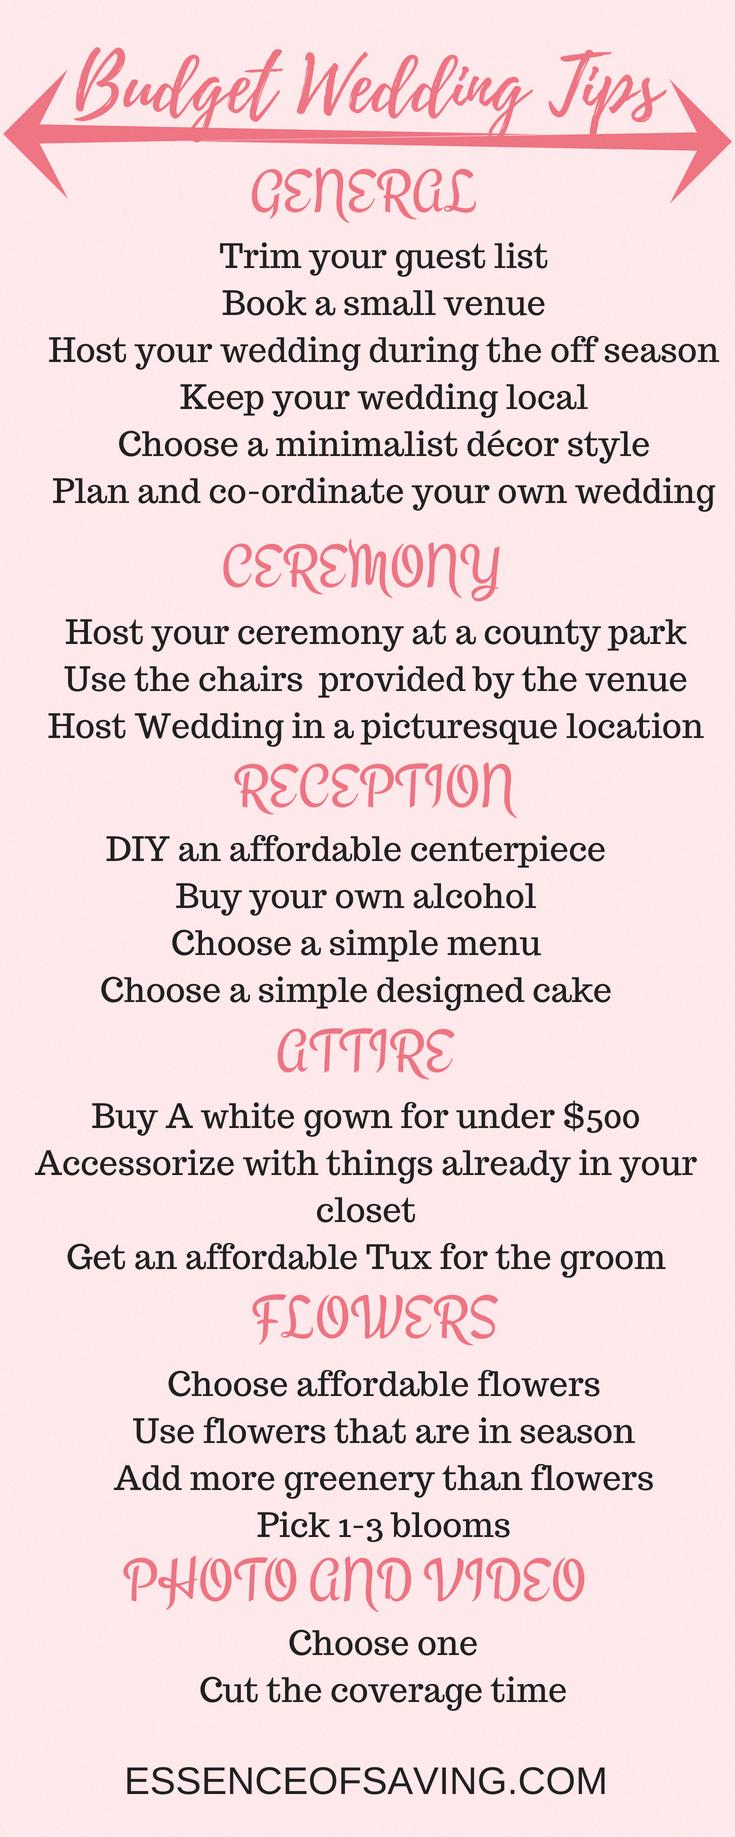 My Wedding Reception Ideas Wedding Tips And Ideas Need